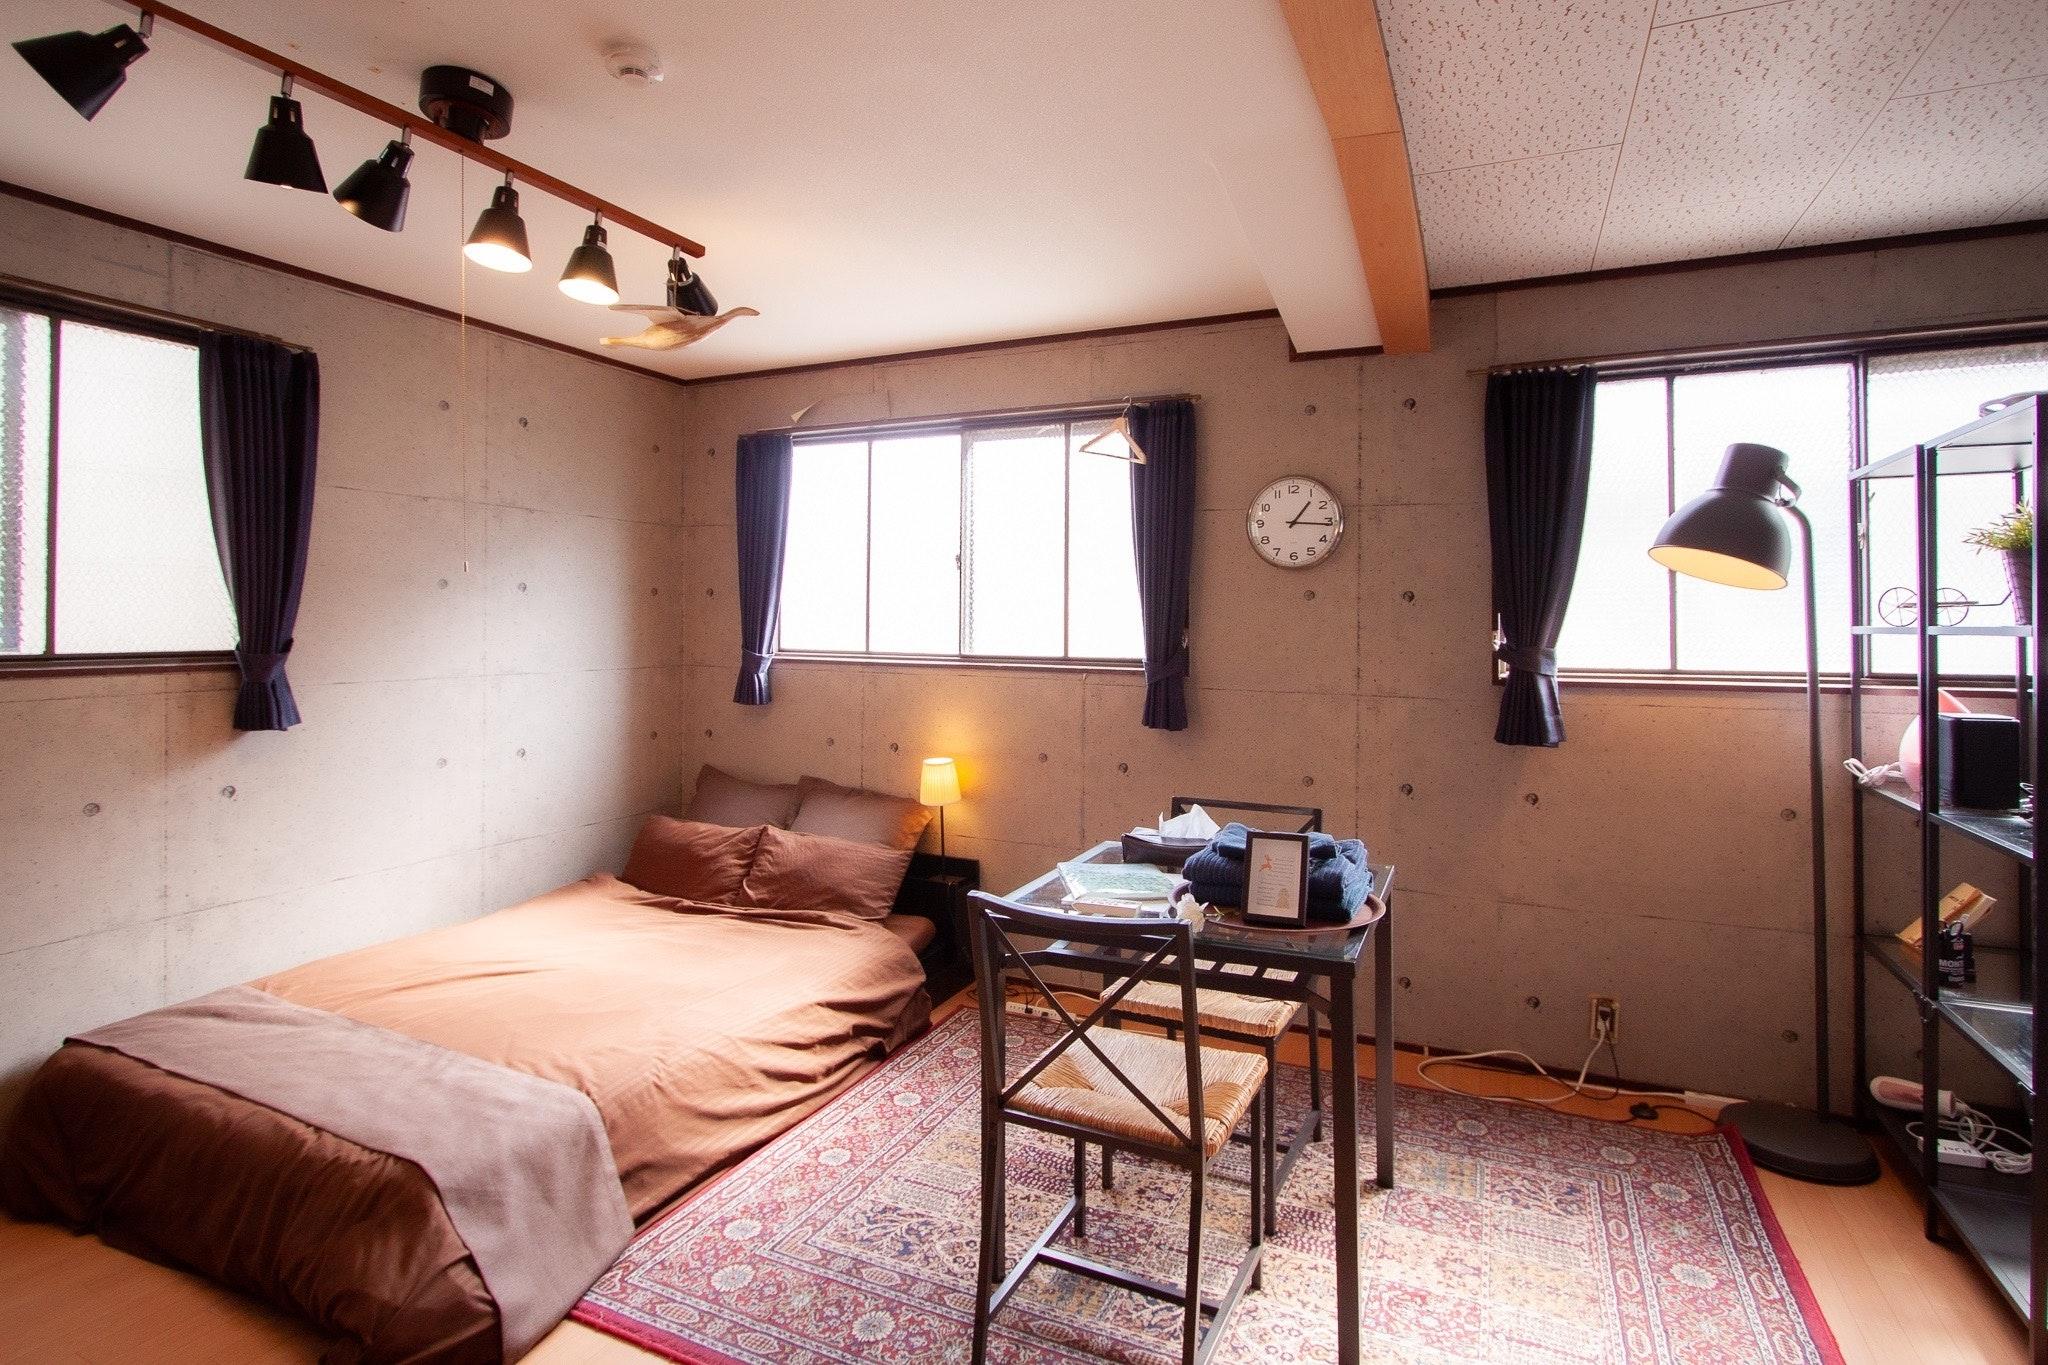 Classic room : 奈良公園近く!改装済みバスルームの綺麗なお部屋